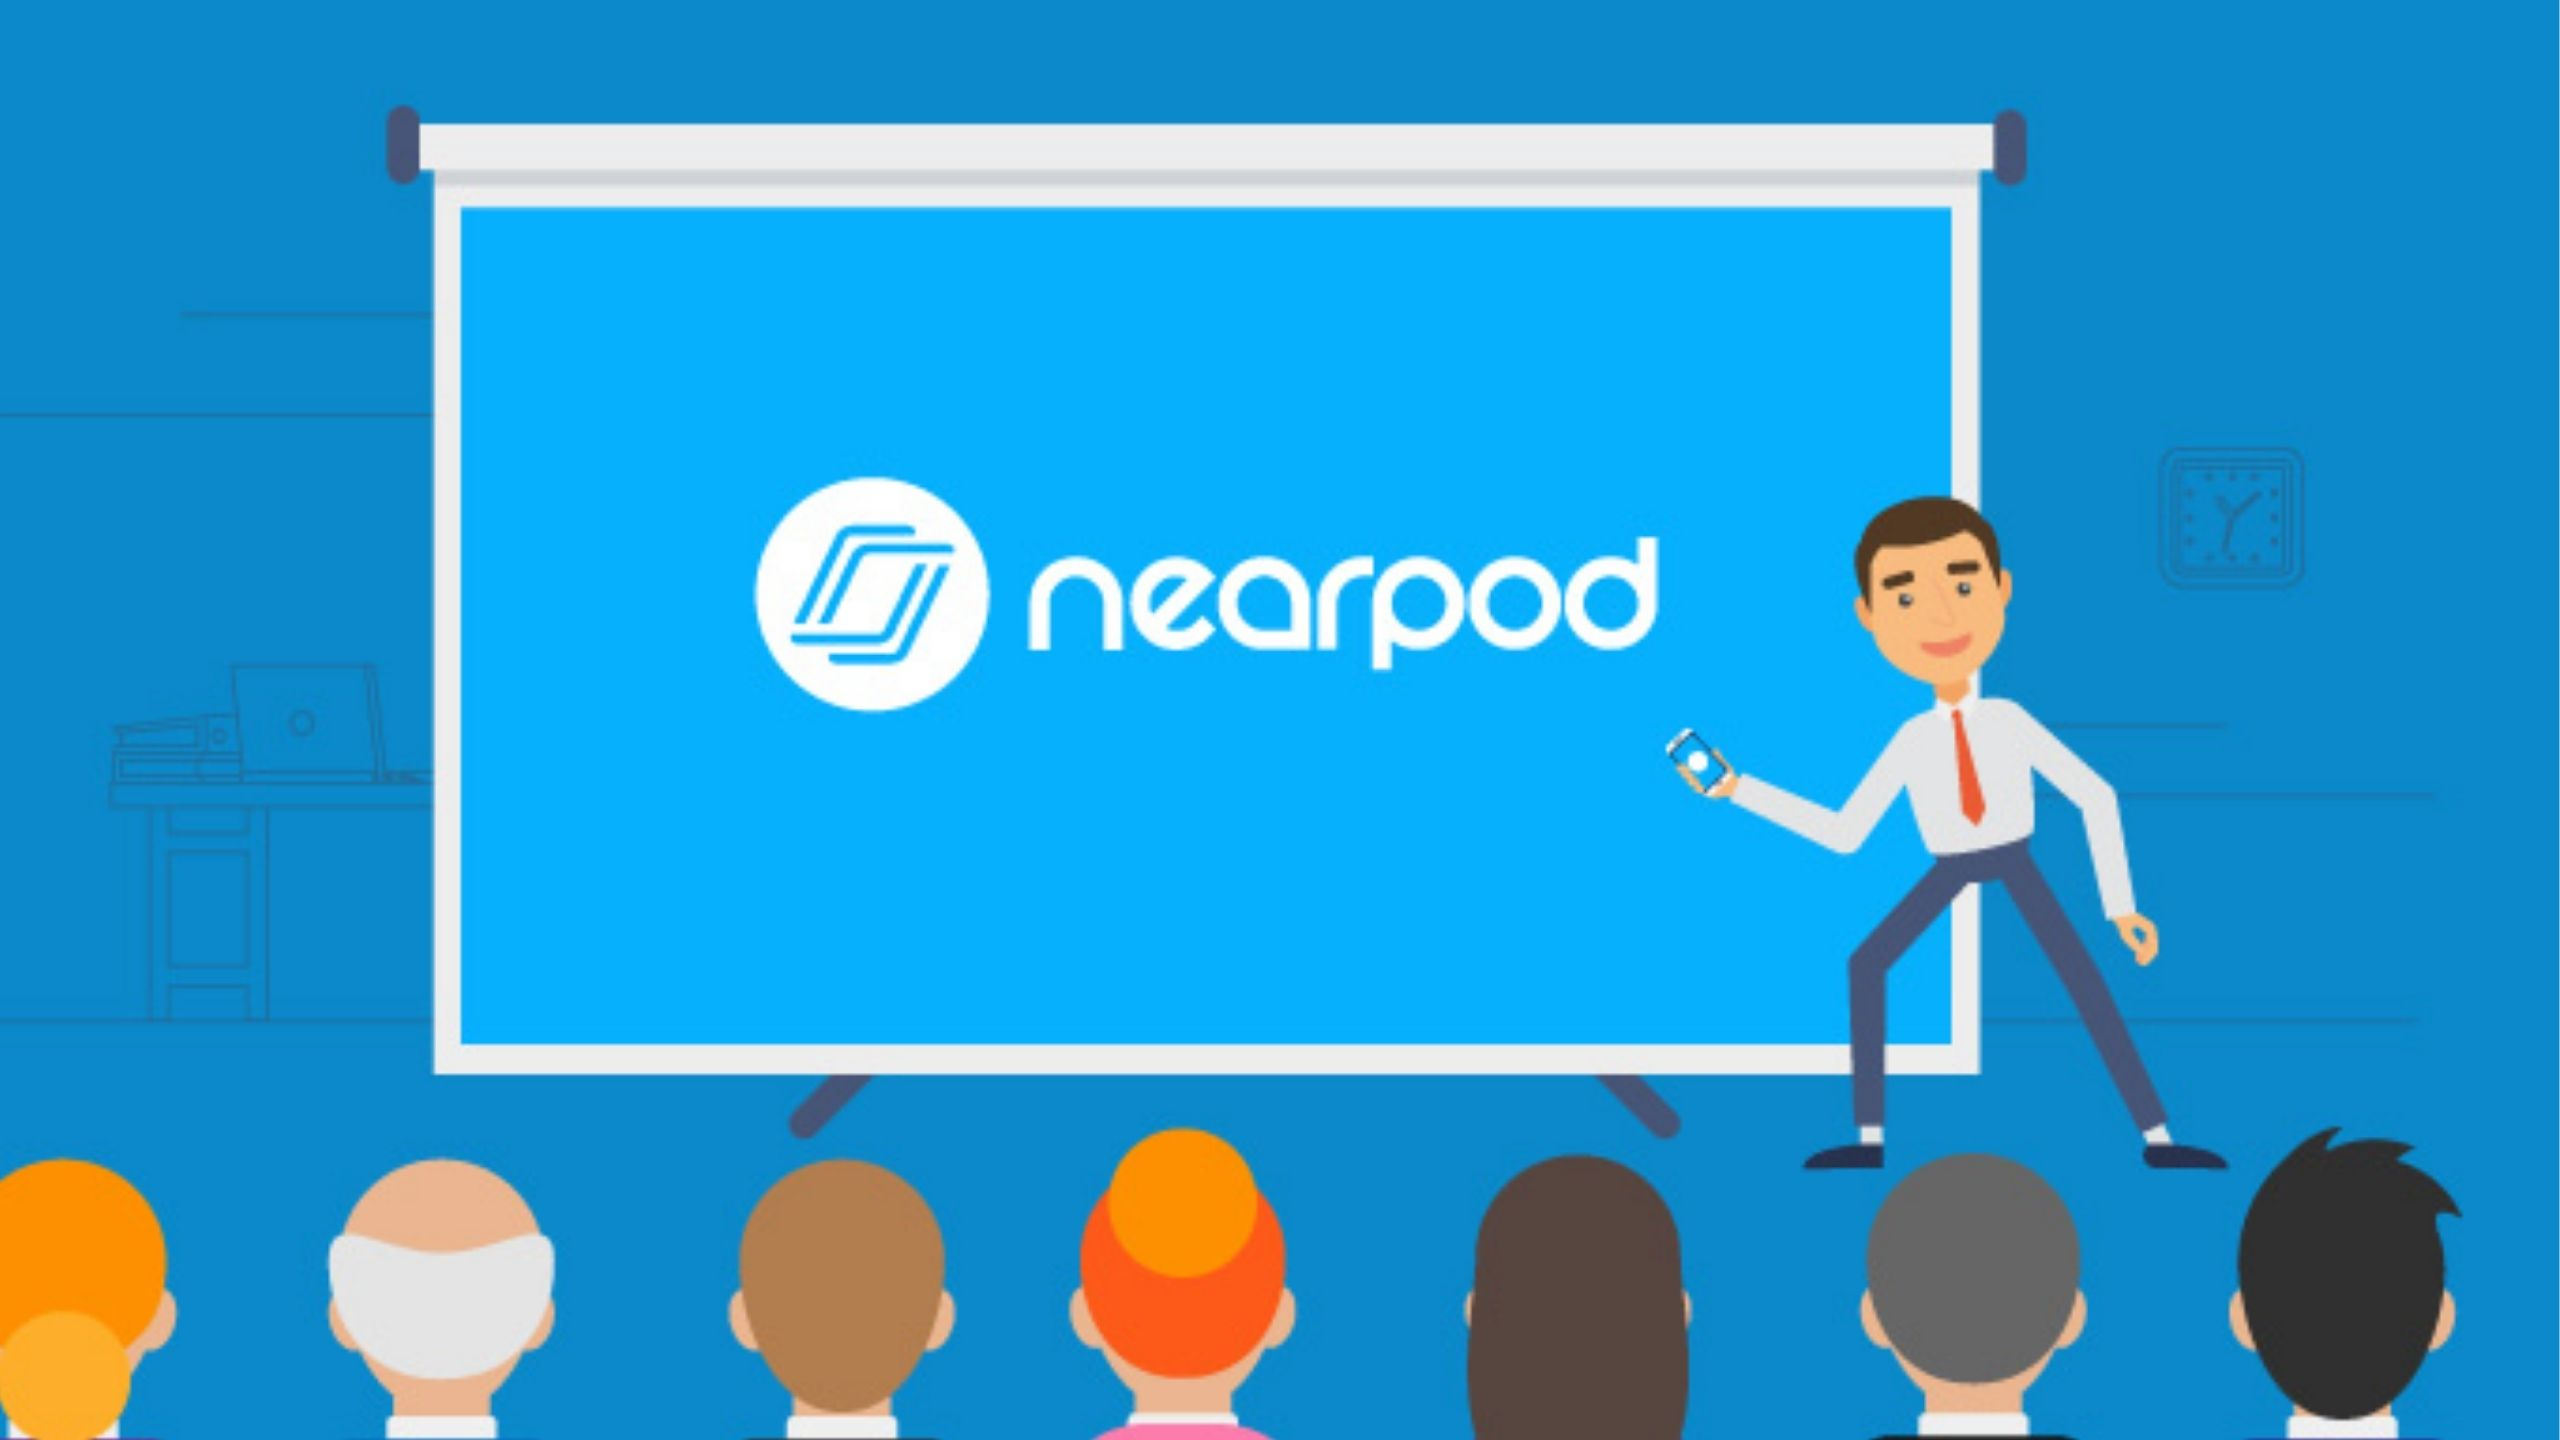 Nearpod Free vs Paid